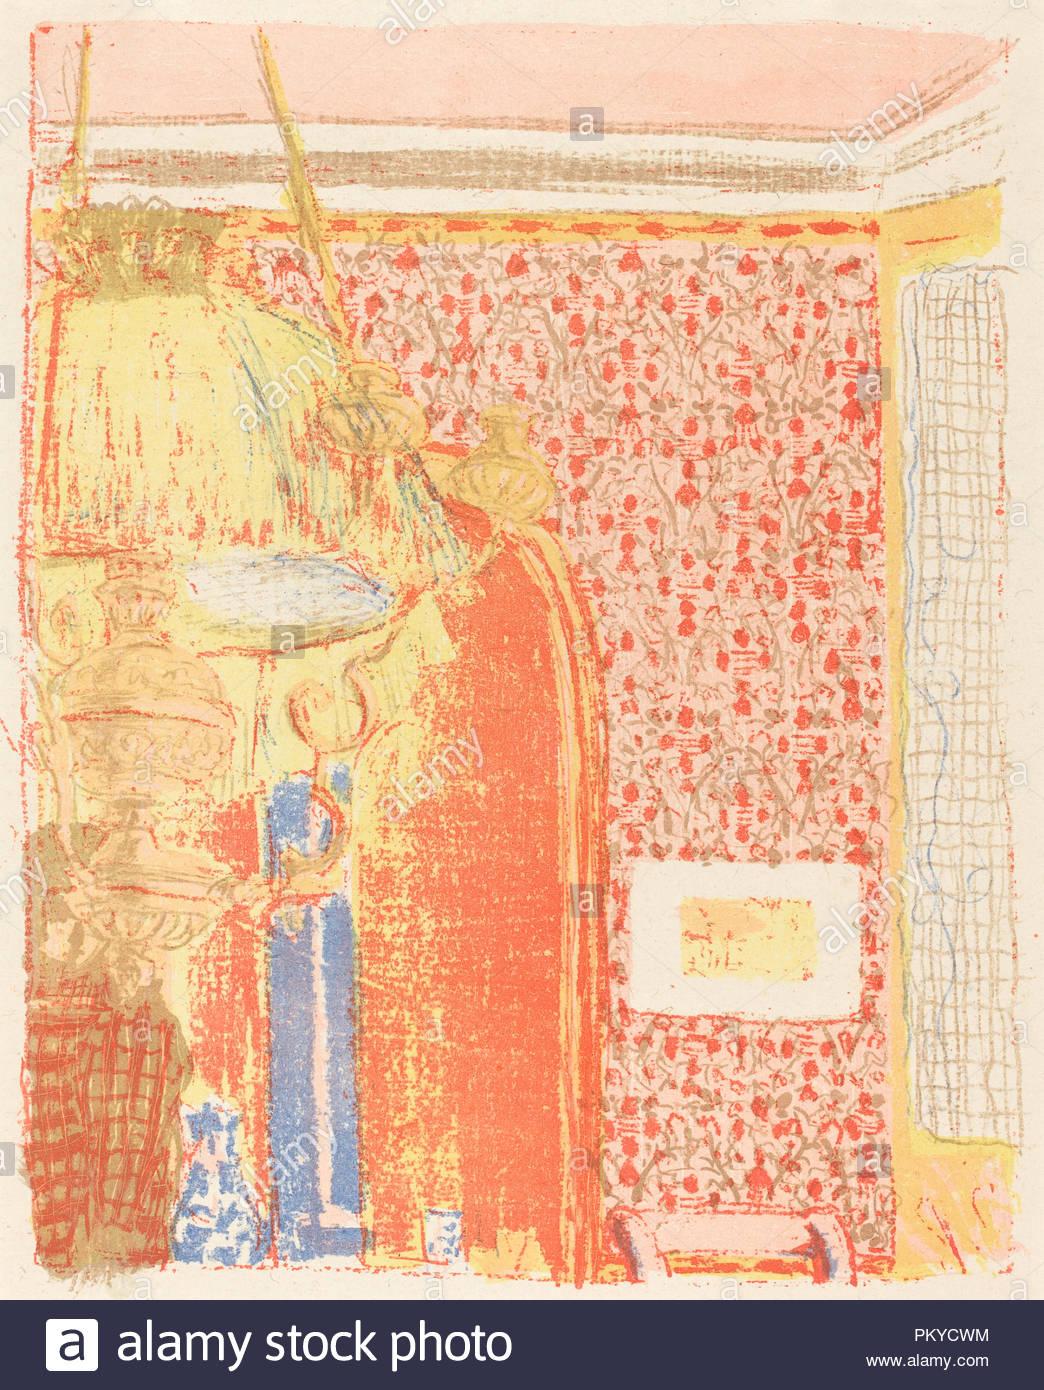 Interieur mit rosa Tapete III (Interieur aux tentures Roses III). Vom: C. 1896 (veröffentlicht 1899). Medium: farblithographie auf China Papier. Museum: Nationalgalerie, Washington DC. Autor: Edouard Vuillard. Stockbild